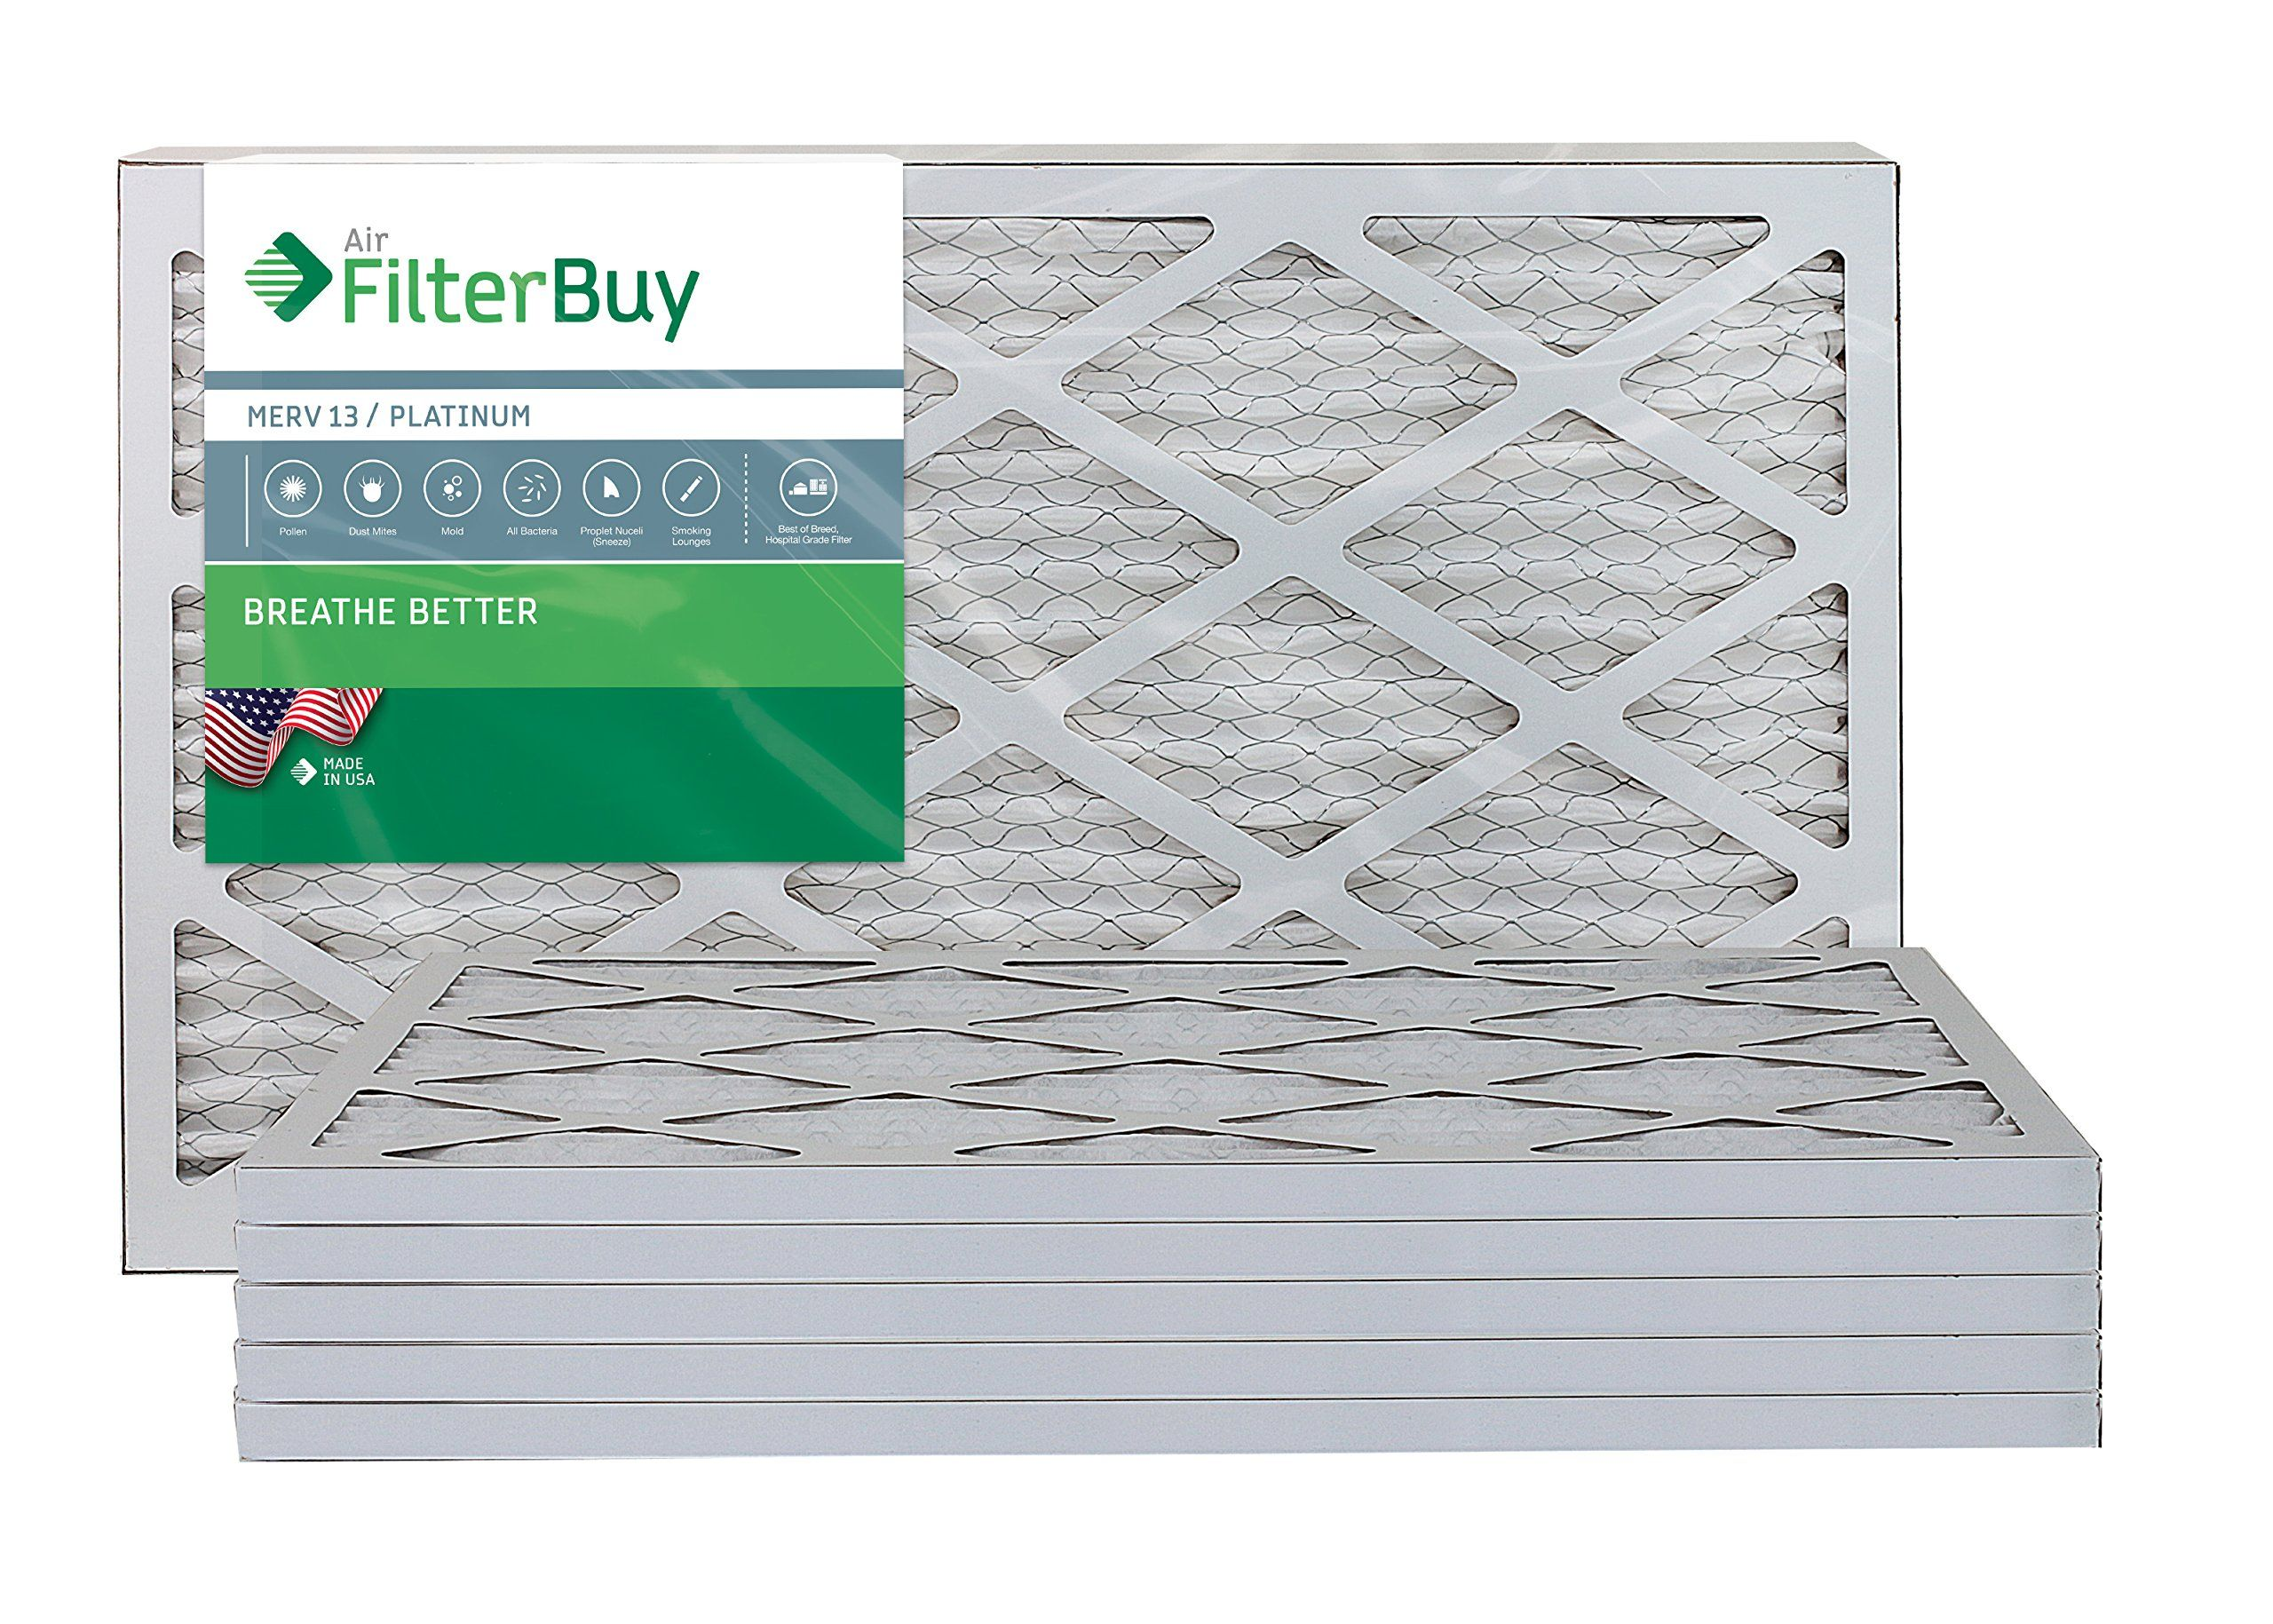 FilterBuy 16x25x1 MERV 13 Pleated AC Furnace Air Filter